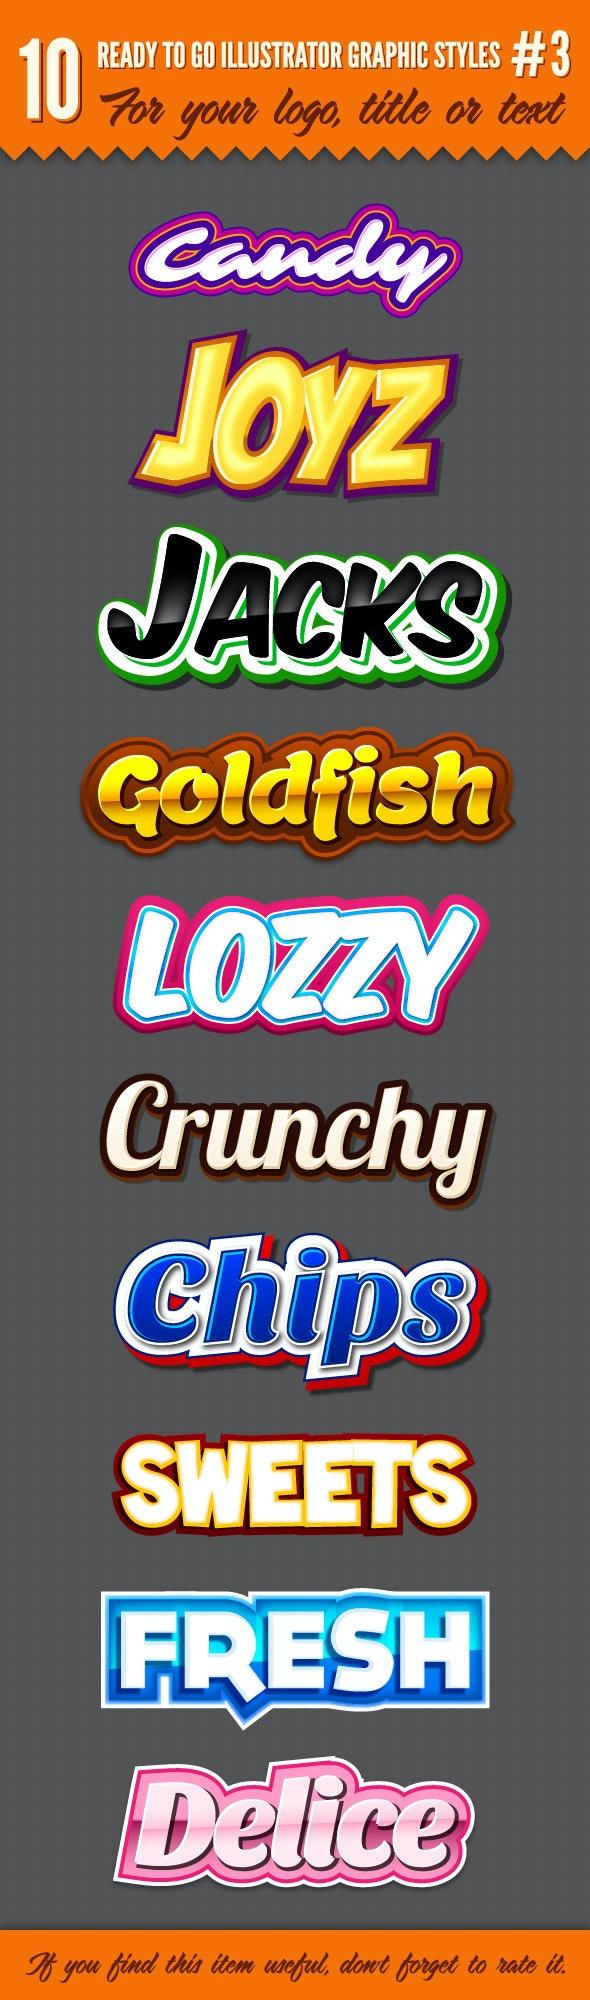 10 Logo Graphic Styles #3 - Styles Illustrator